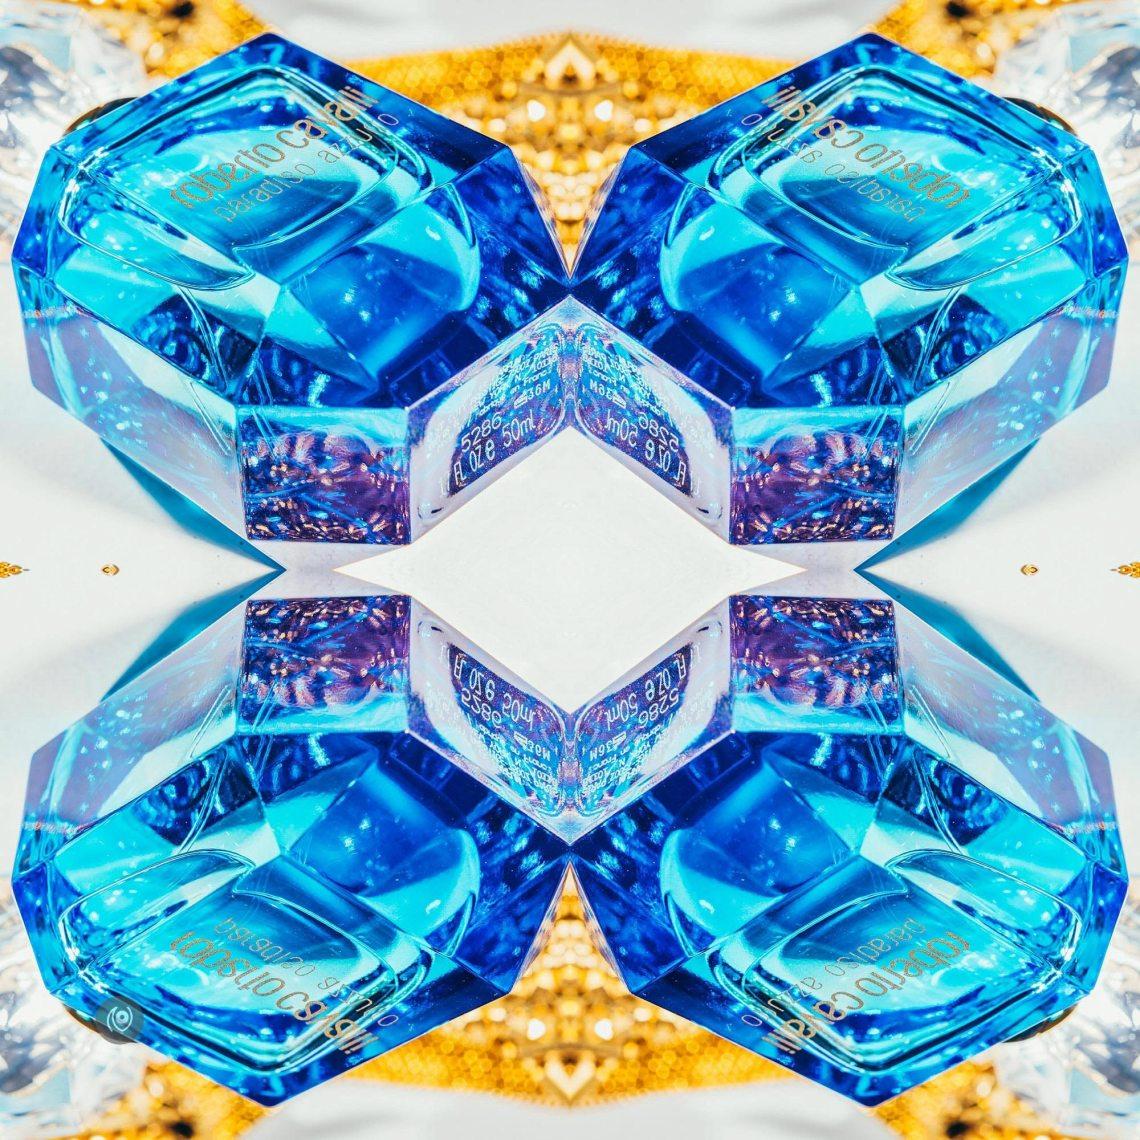 Naina.co, Visual Storyteller, Luxury Brands, Naina Redhu, Professional Photographer, Experience Collector, Luxury Photographer, Luxury Blogger, Lifestyle, Visual Storyteller for Luxury Brands, Parfumier, Unisex, Fragrance, Perfume, Scent, #FragranceOfTheMonth, FragranceOfTheMonth, Fragrance Of The Month, Roberto Cavalli, Paradiso Azzurro, Ocean, Beach, Blue, Gold, Azure, Water, Mediterranean, Lousie Turner, Eva Maria Duringer